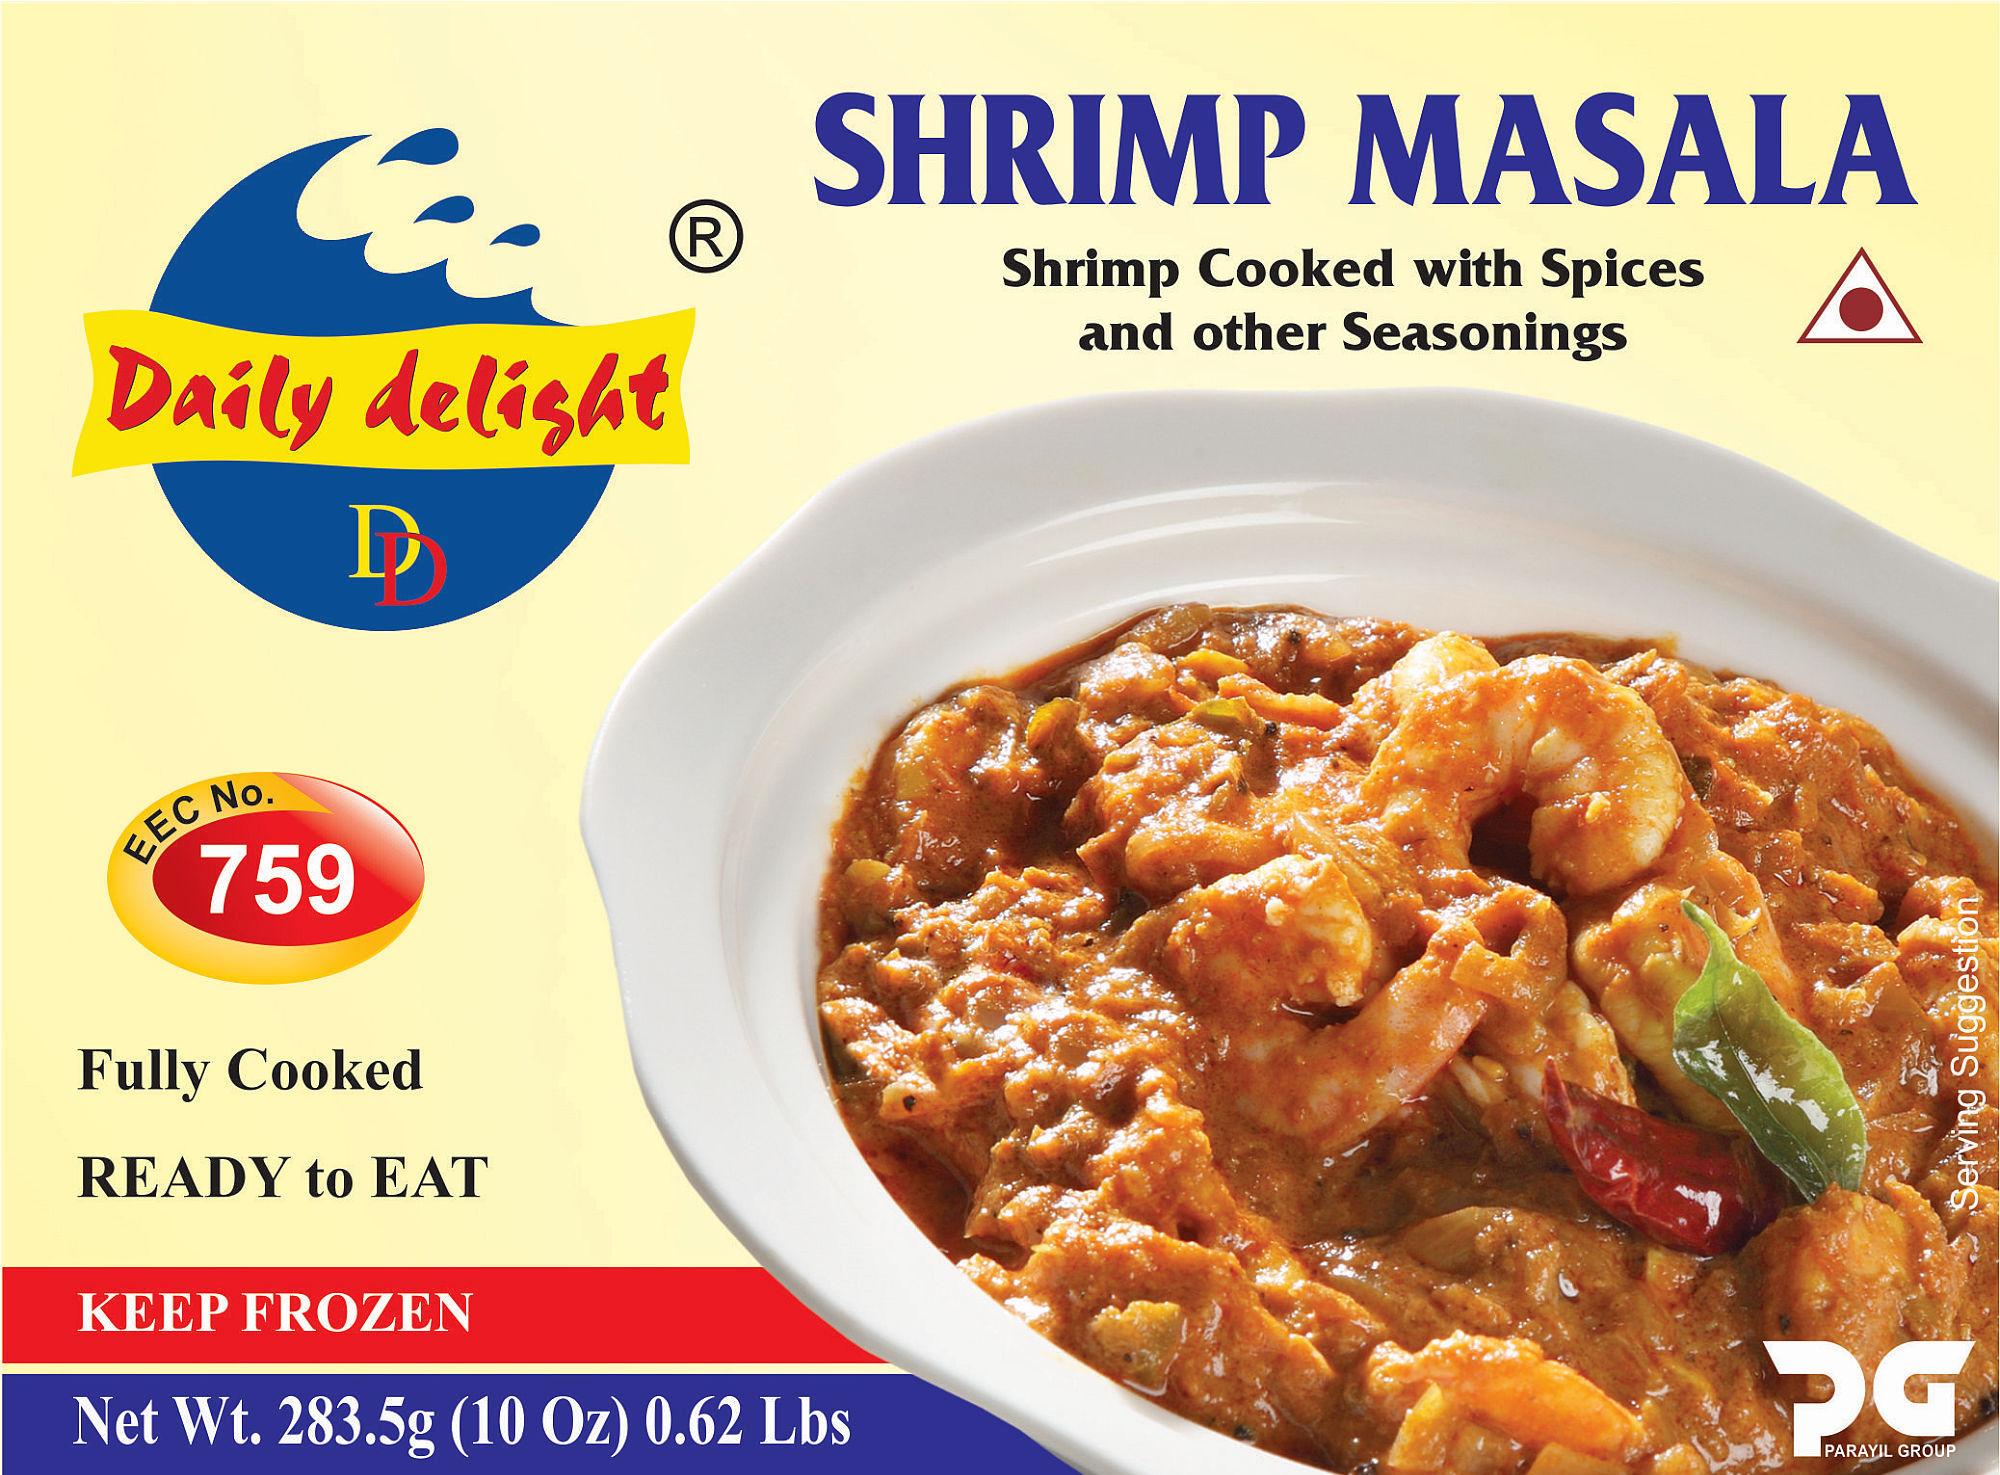 Daily Delight Shrimp Masala